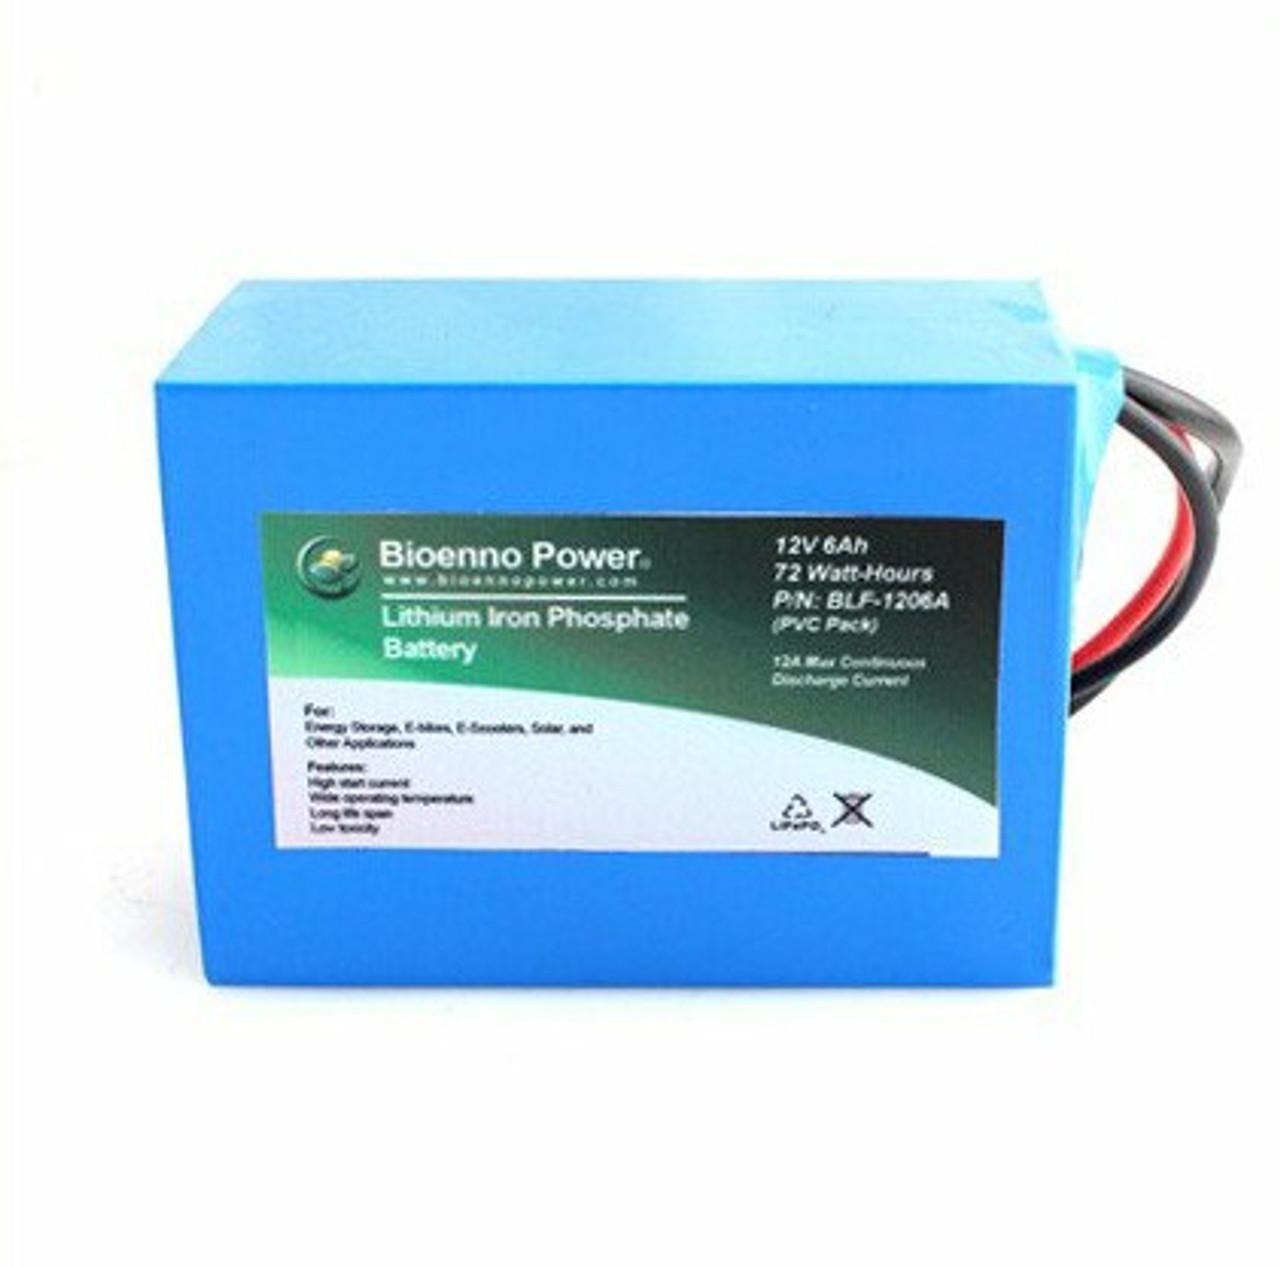 Bioenno Power 12 Volt, 6 Amp Hour Lithium Iron Phosphate Battery